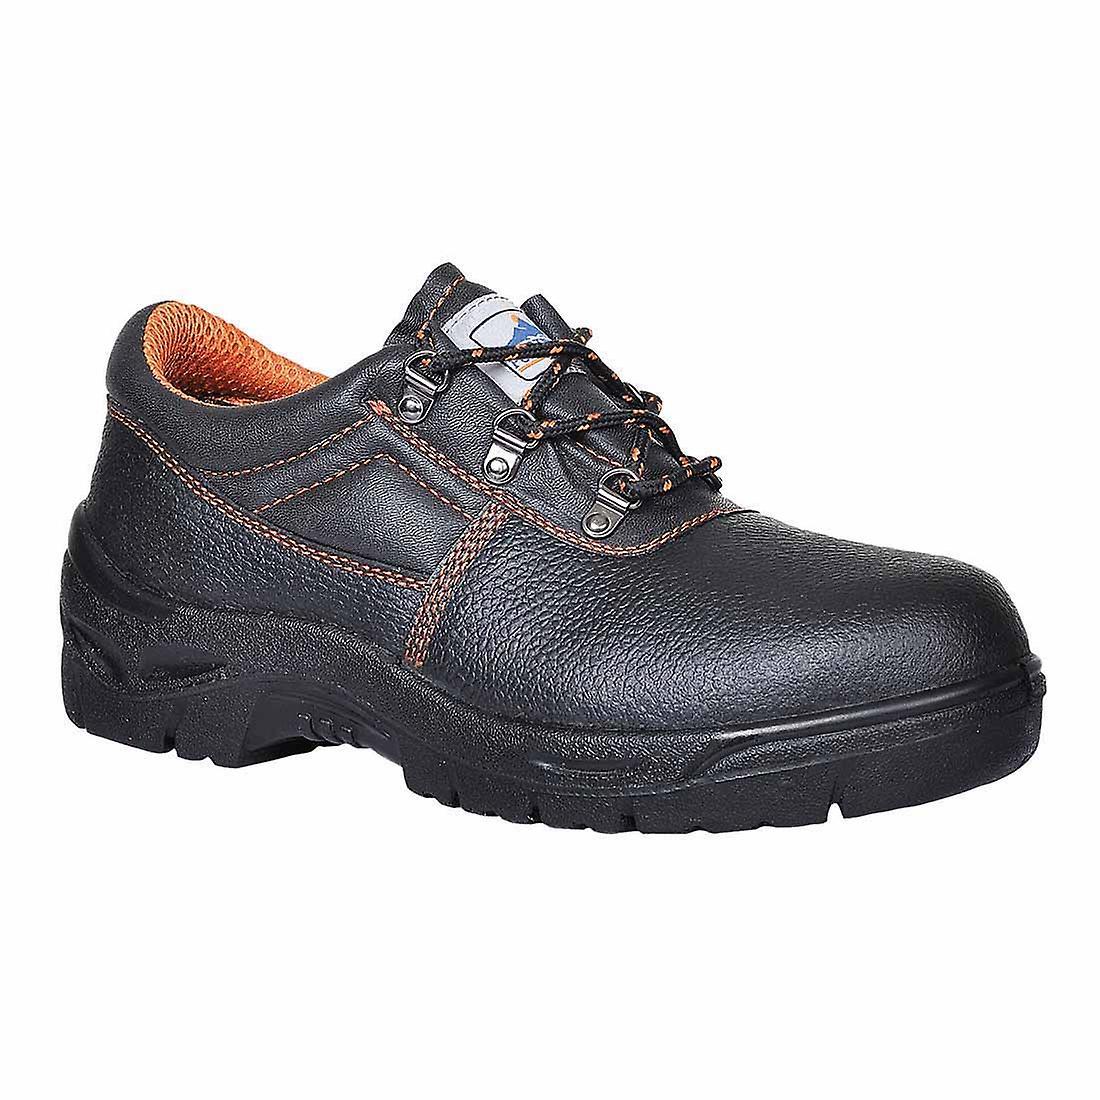 SUw - Steelite Ultra Workwear Safety scarpe S1P | Sconto  | Maschio/Ragazze Scarpa